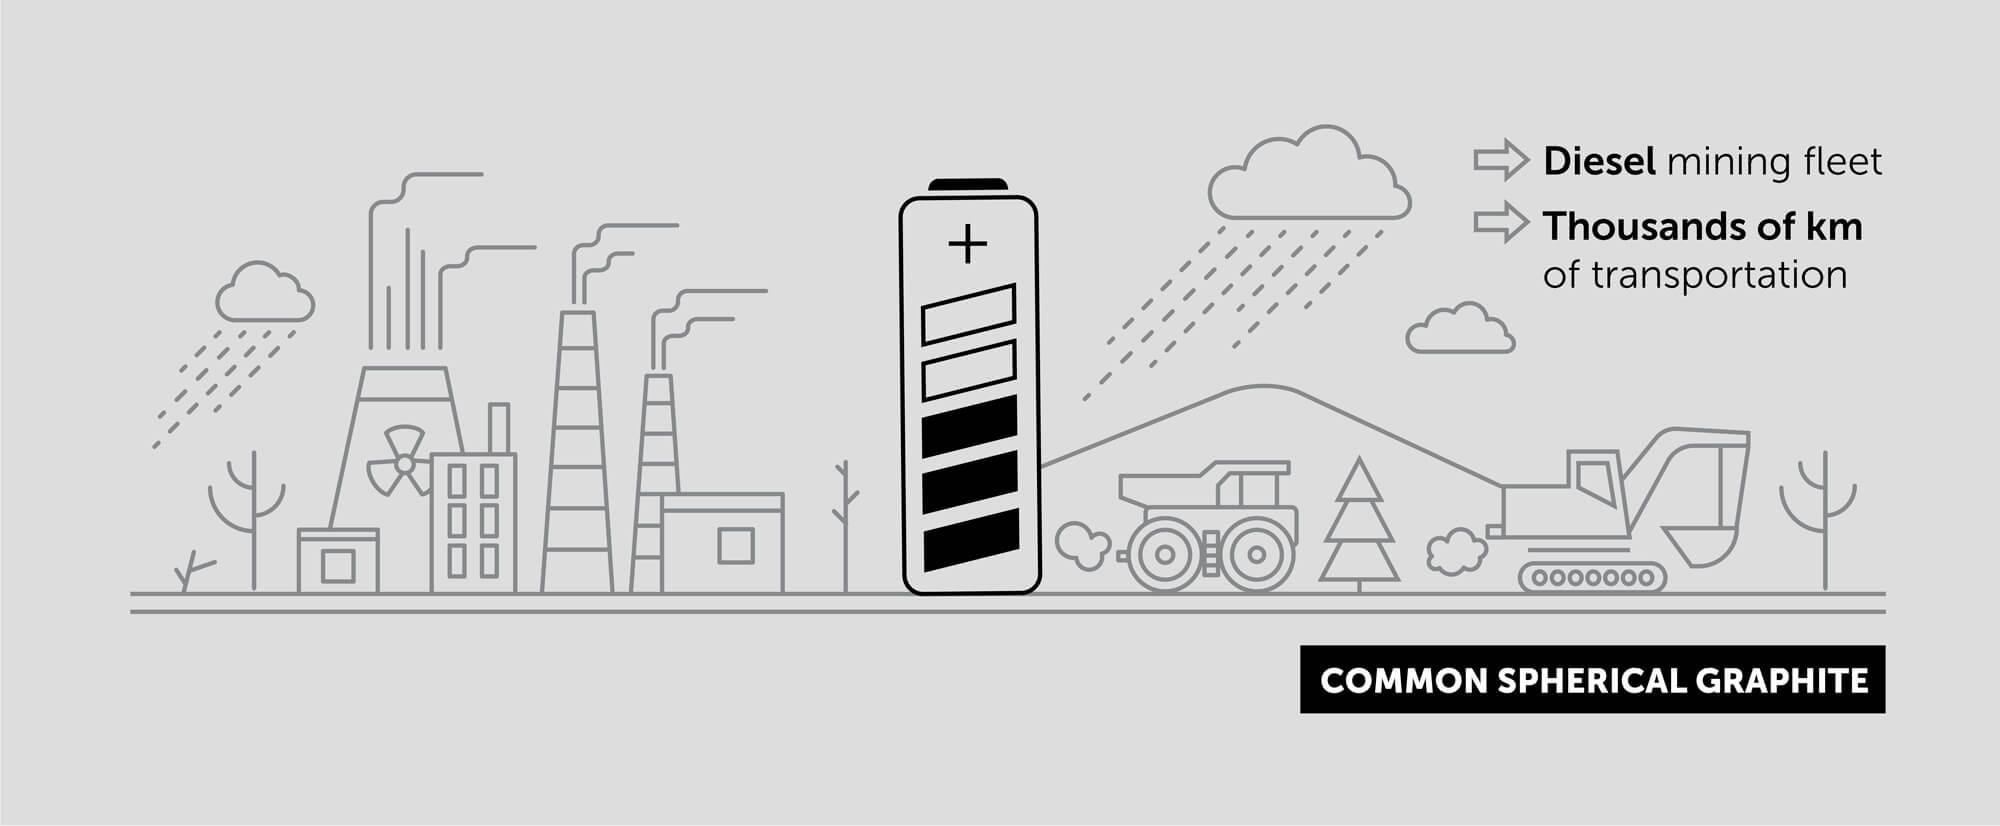 Illustration of diesel graphite transportation